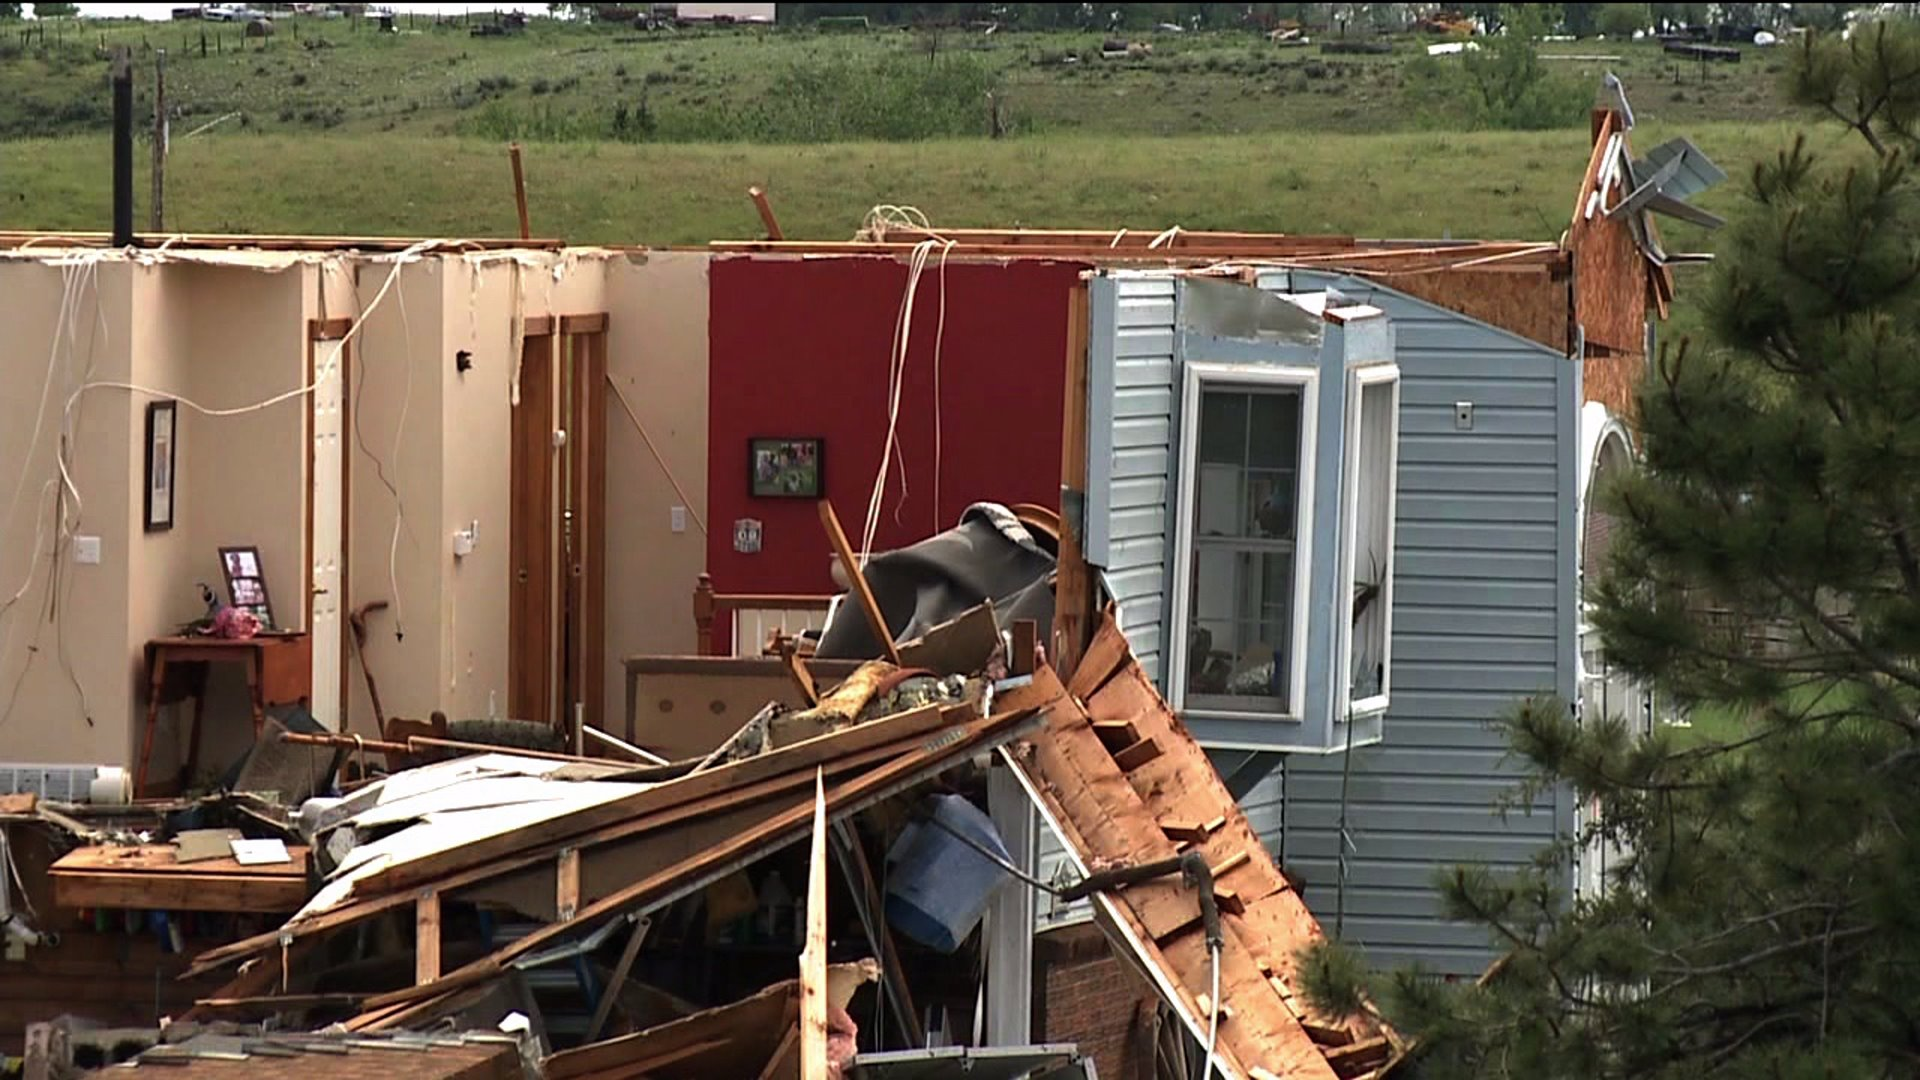 Destruction after tornado in Berthoud